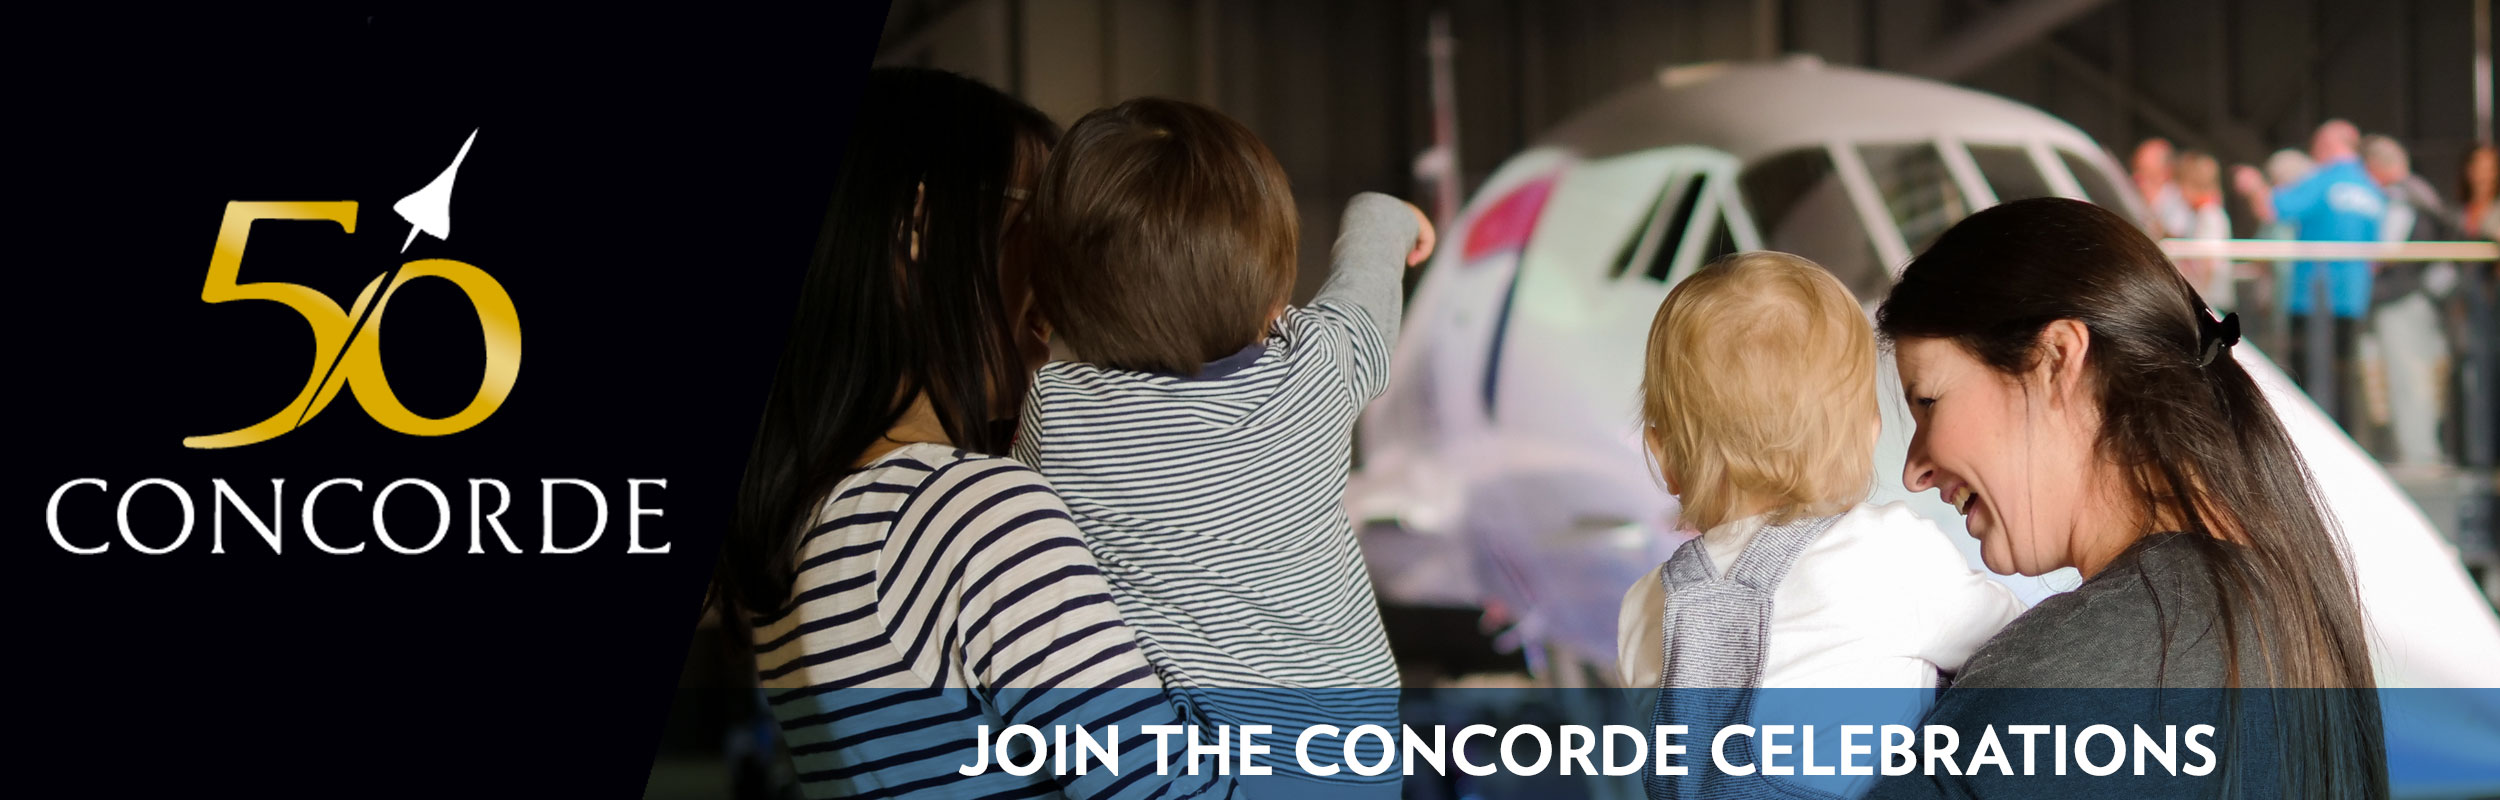 Concorde50-events.jpg